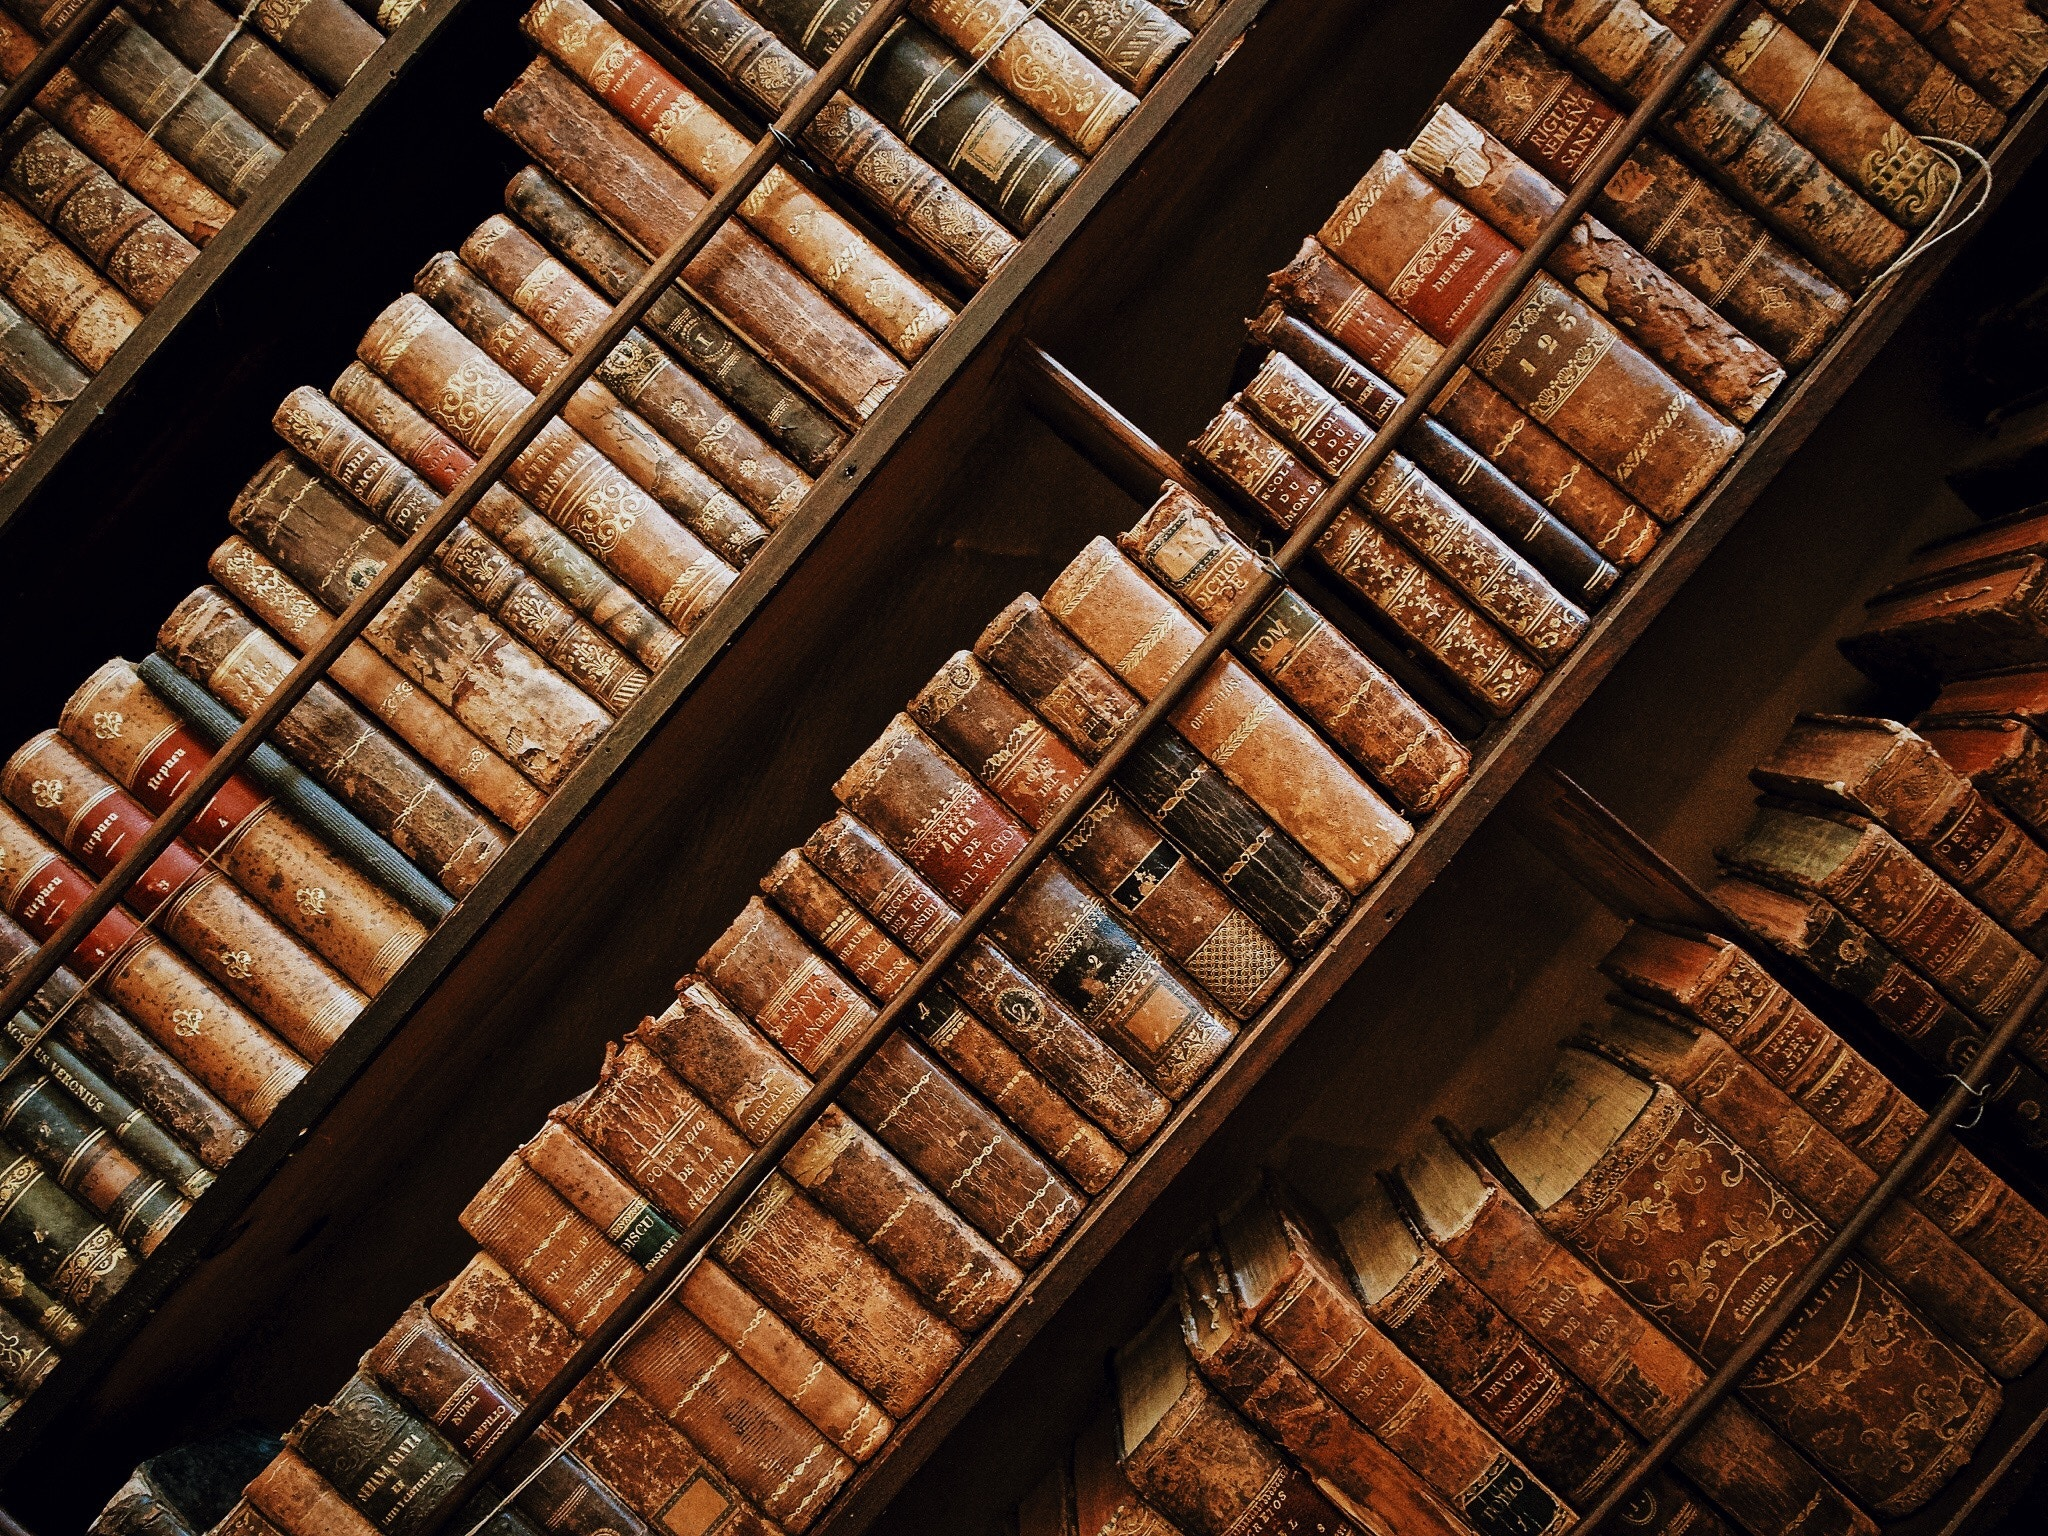 Reasons to Study Church History